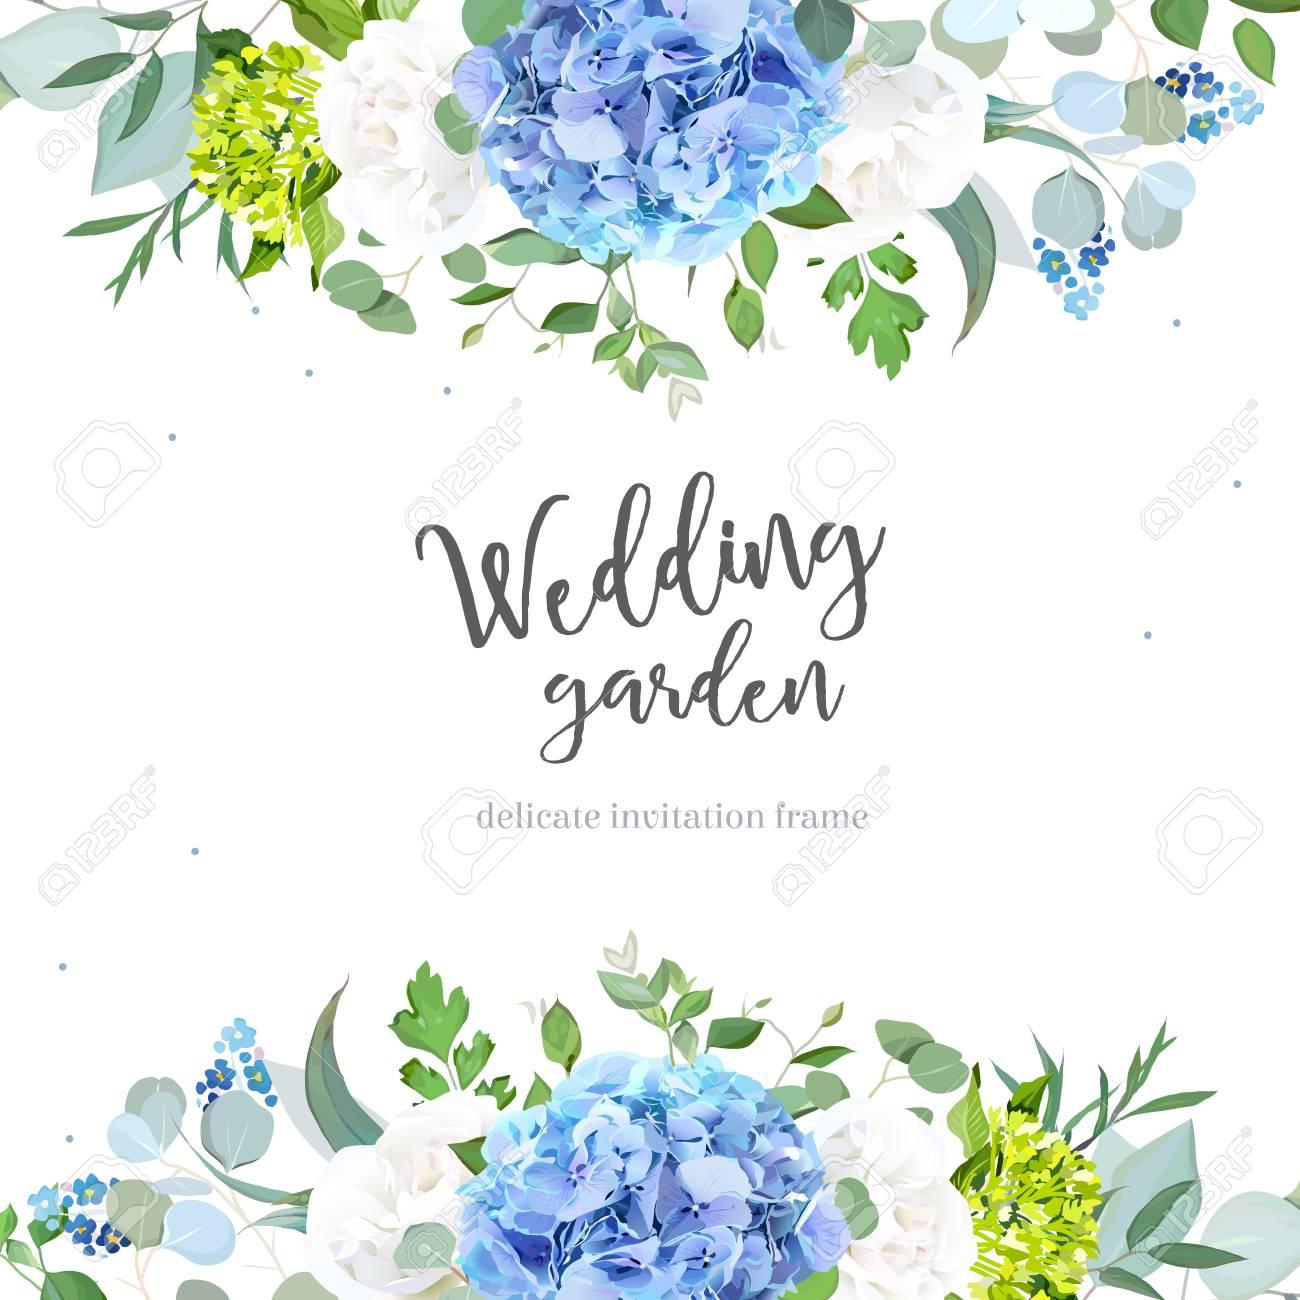 Light blue hydrangea, white rose, forget me not wildflowers, euc - 101907179